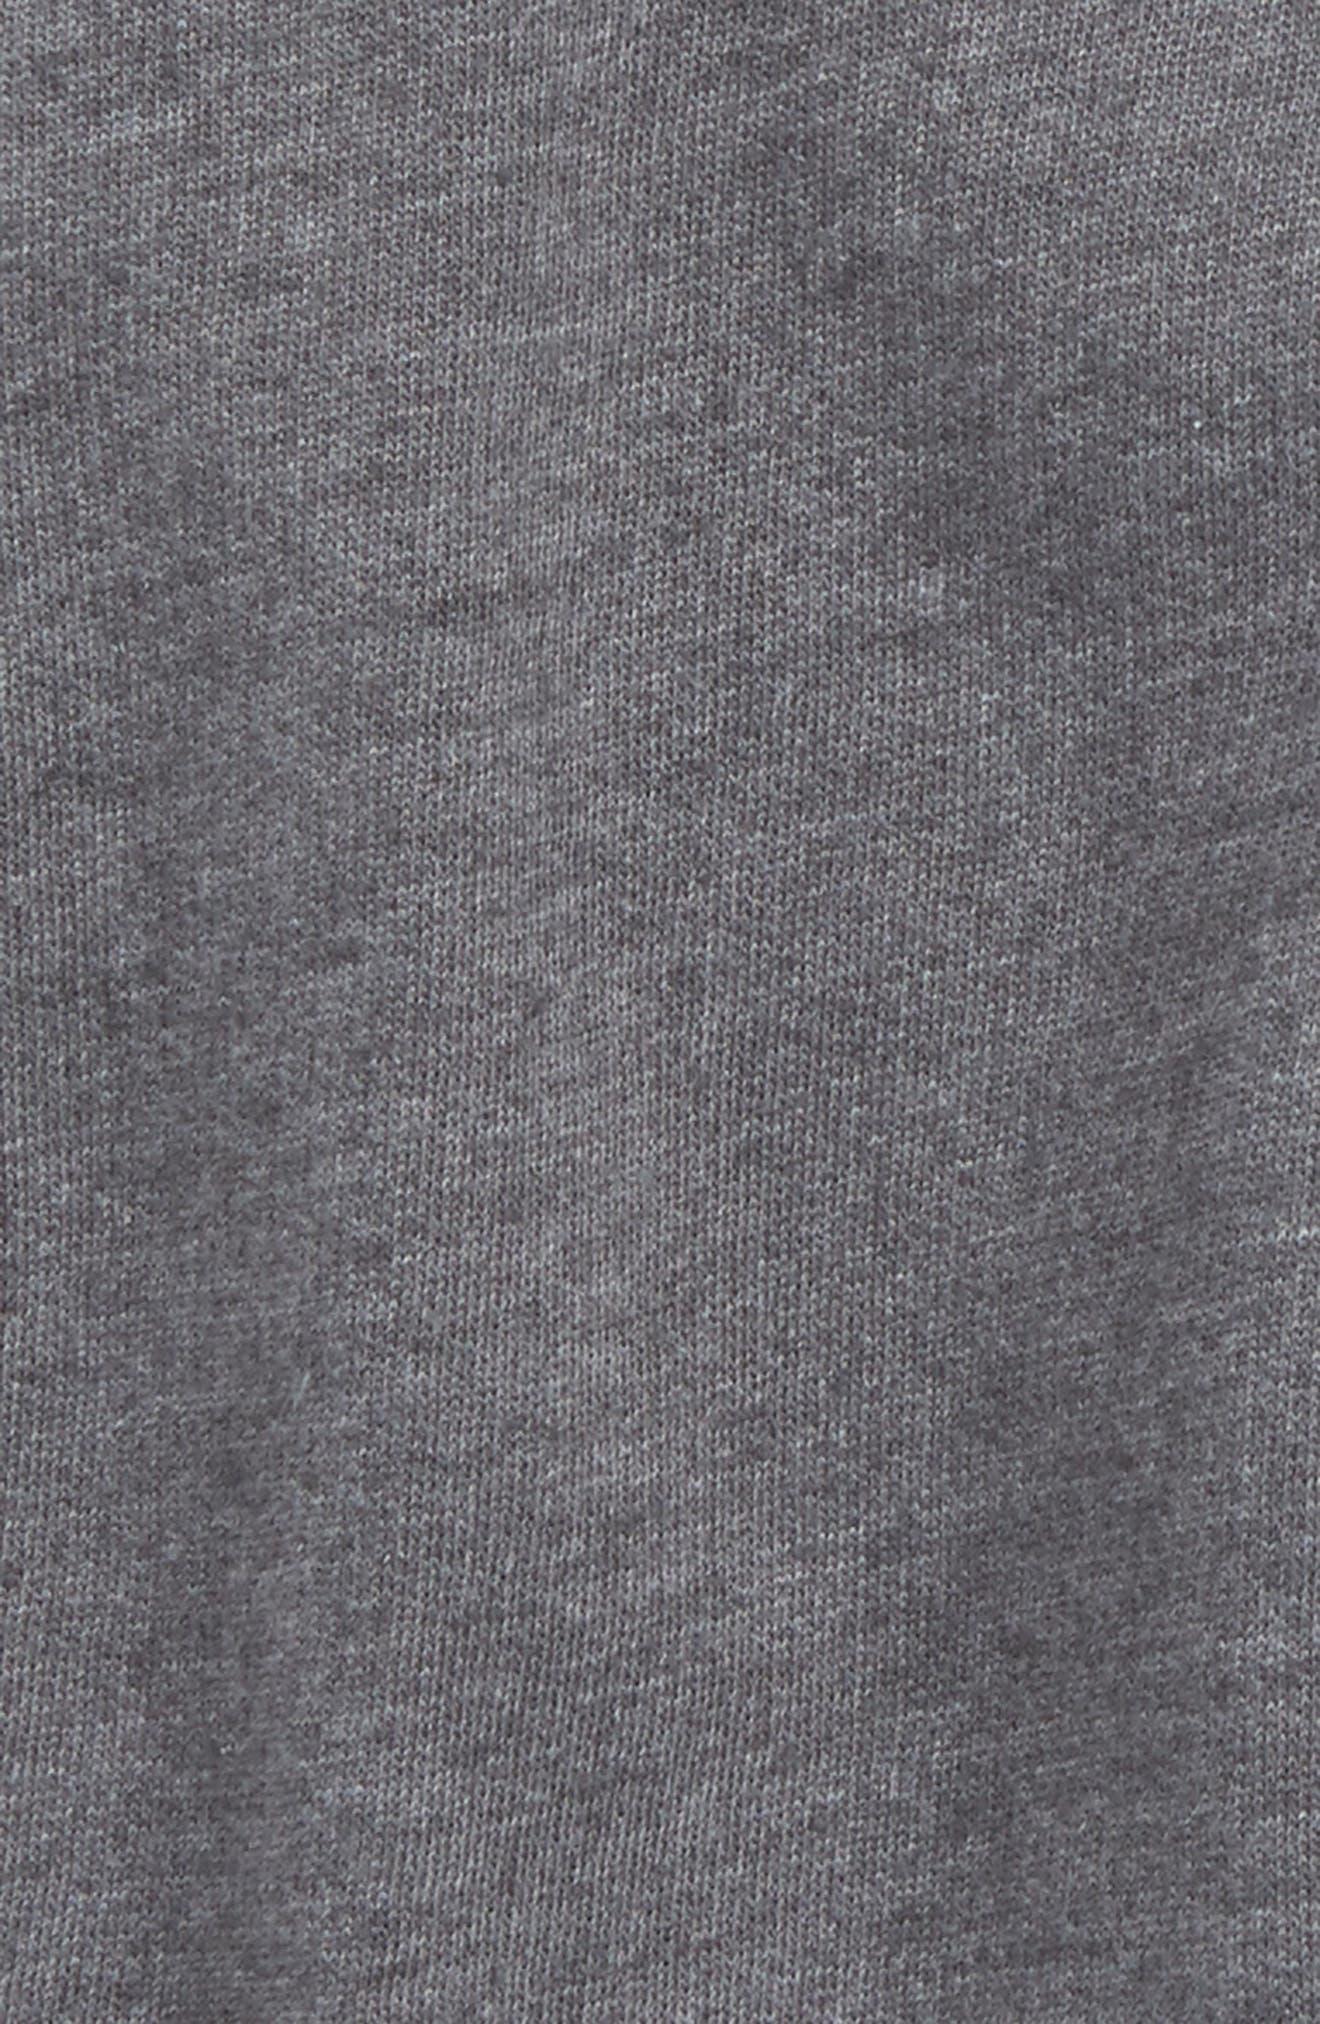 Fleece Sweatpants,                             Alternate thumbnail 2, color,                             GREY CHARCOAL HEATHER